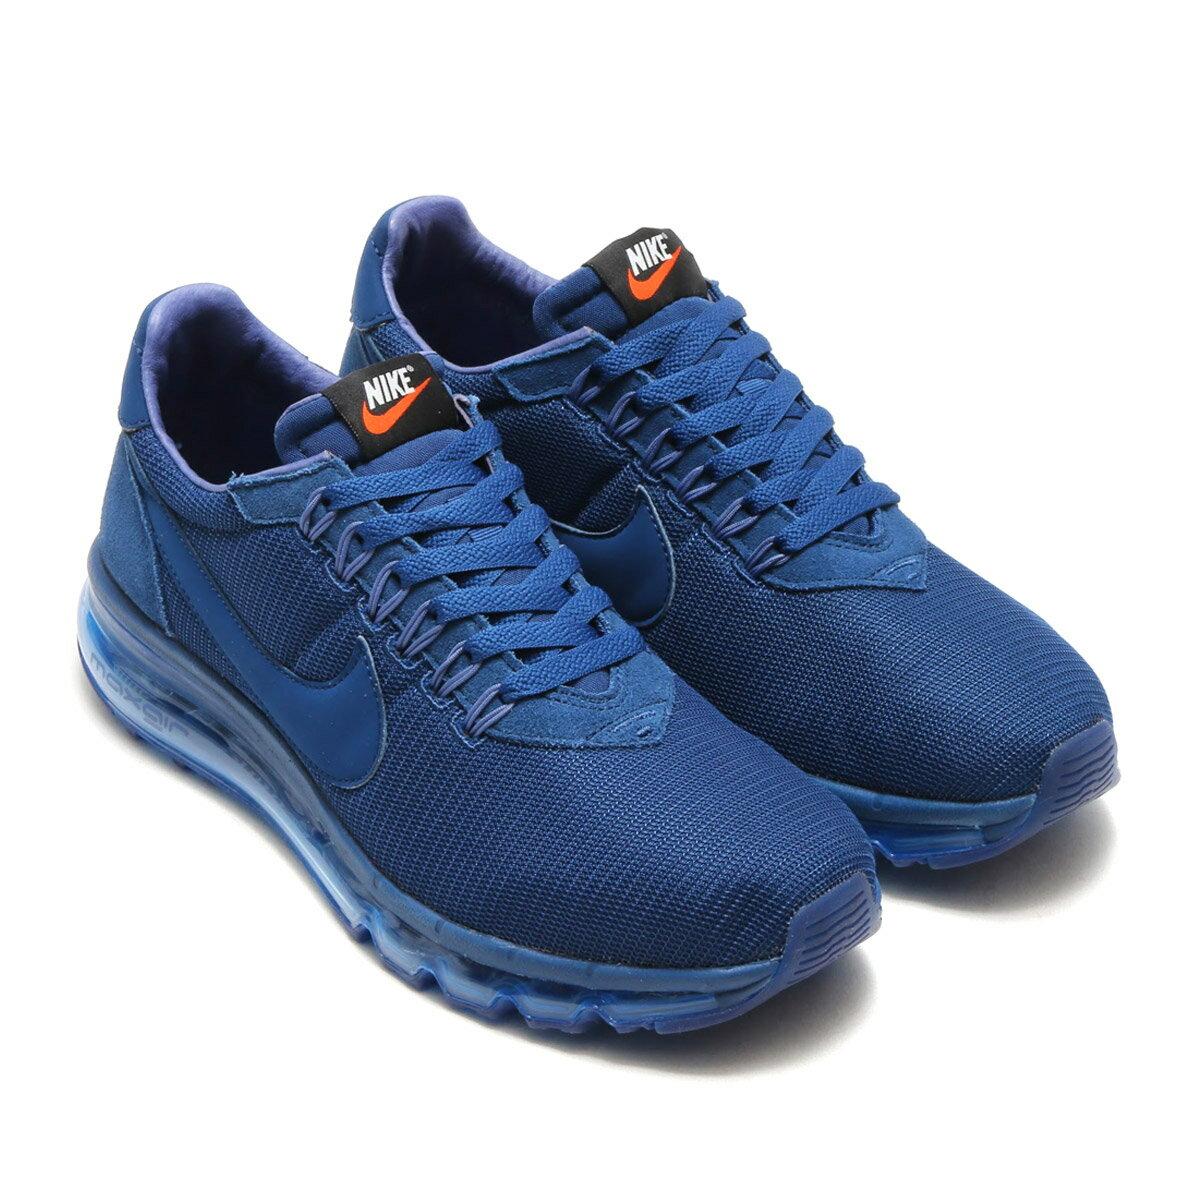 NIKE AIR MAX LD-ZERO(ナイキ エア マックス LD ゼロ)(COASTAL BLUE/COASTAL BLUE-BLUE MOON)17SP-S